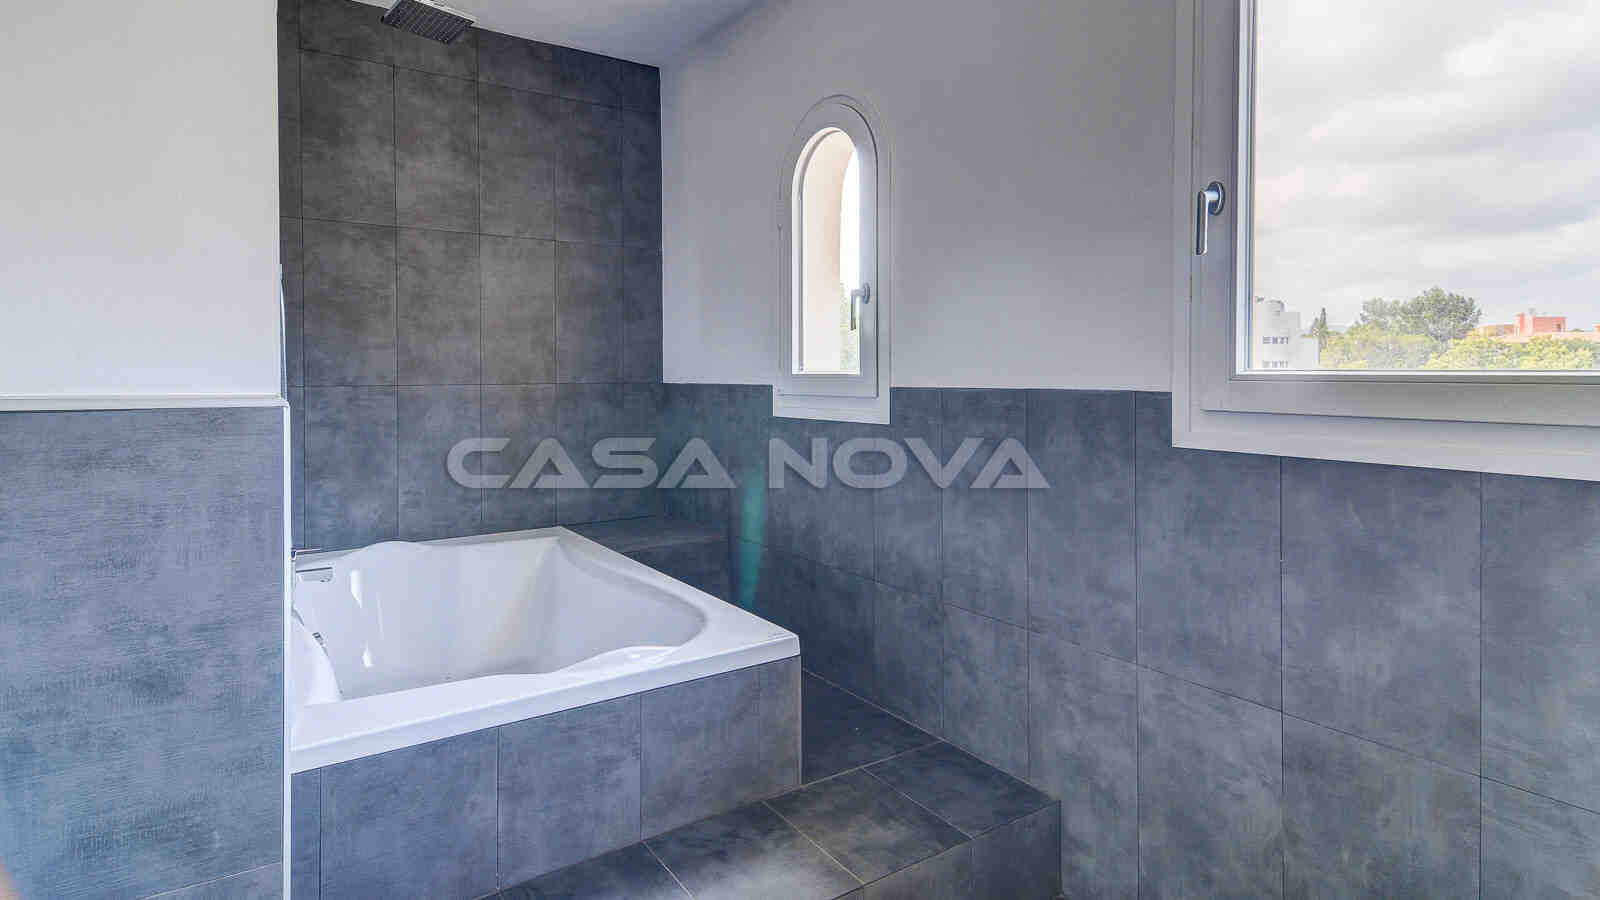 Tolles Badezimmer mit Jacuzzi